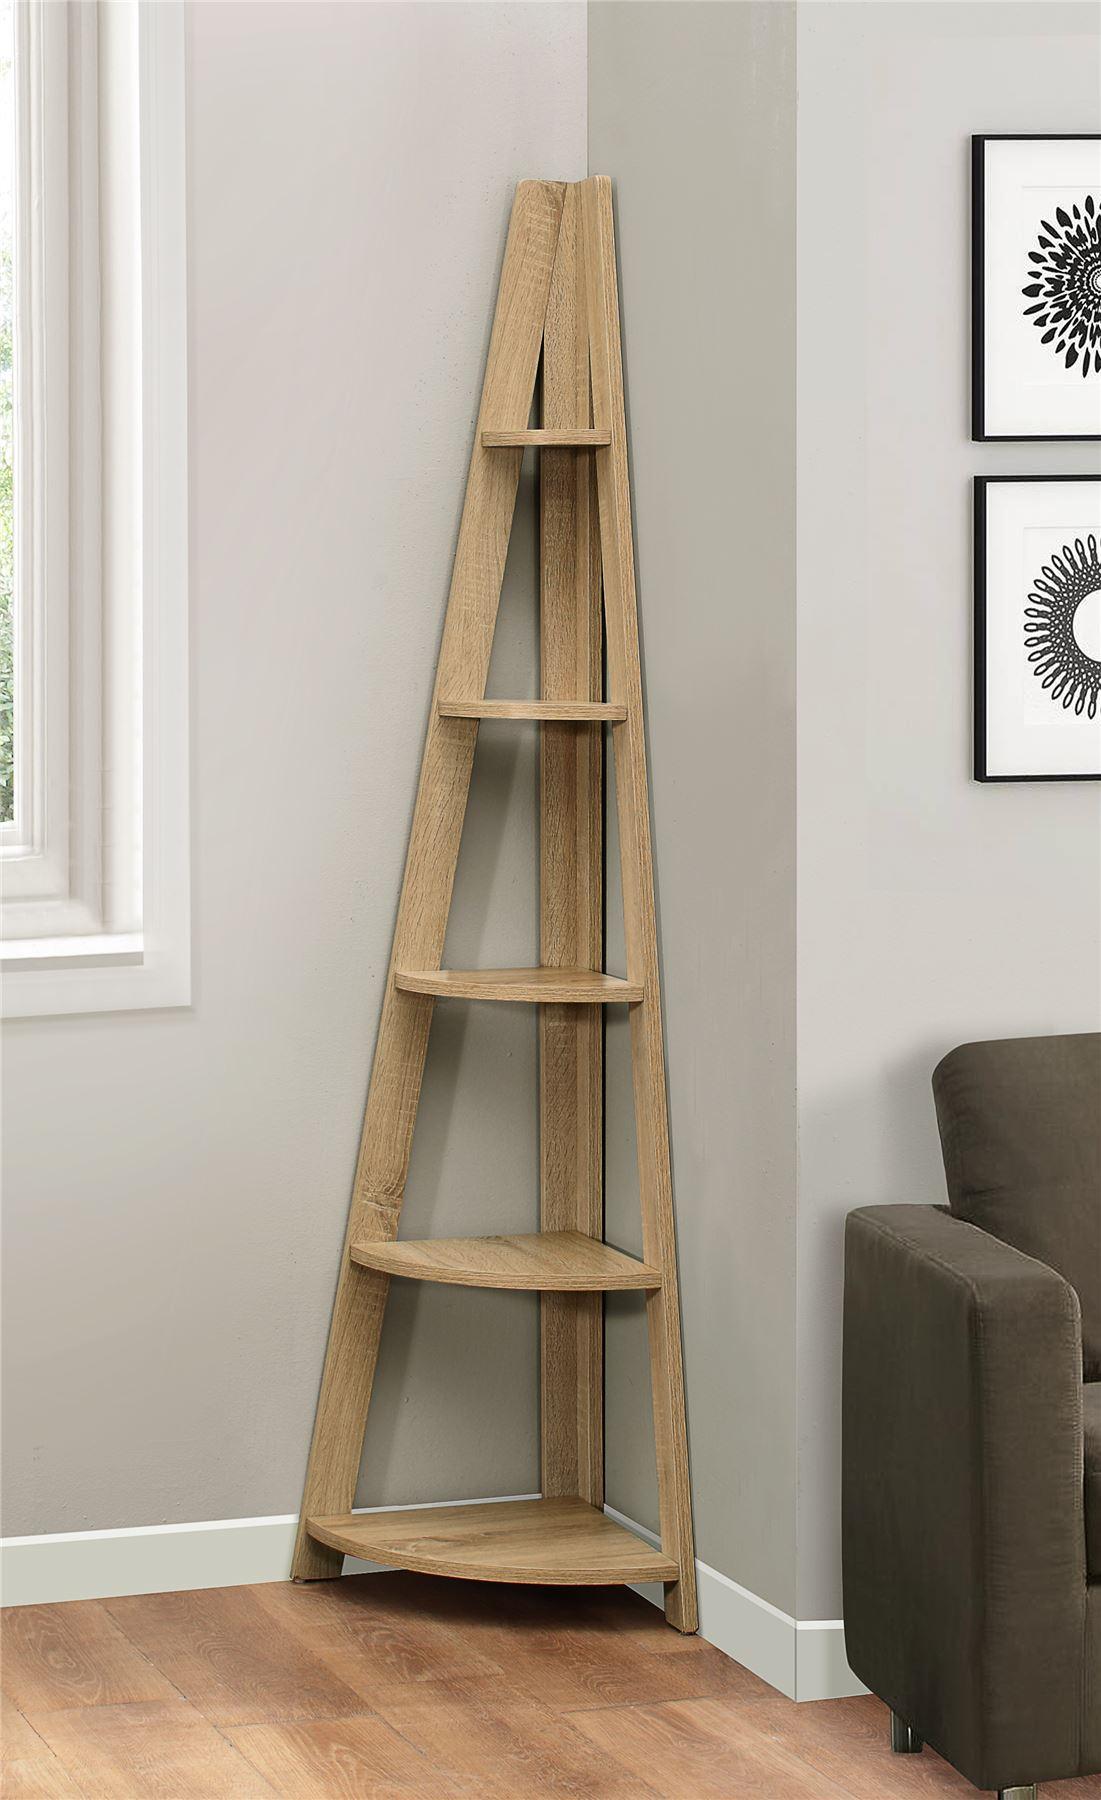 Birlea Nordic Scandinavian Retro Corner Ladder Bookcase Shelving Shelf Unit Oak 5060460024232 Ebay